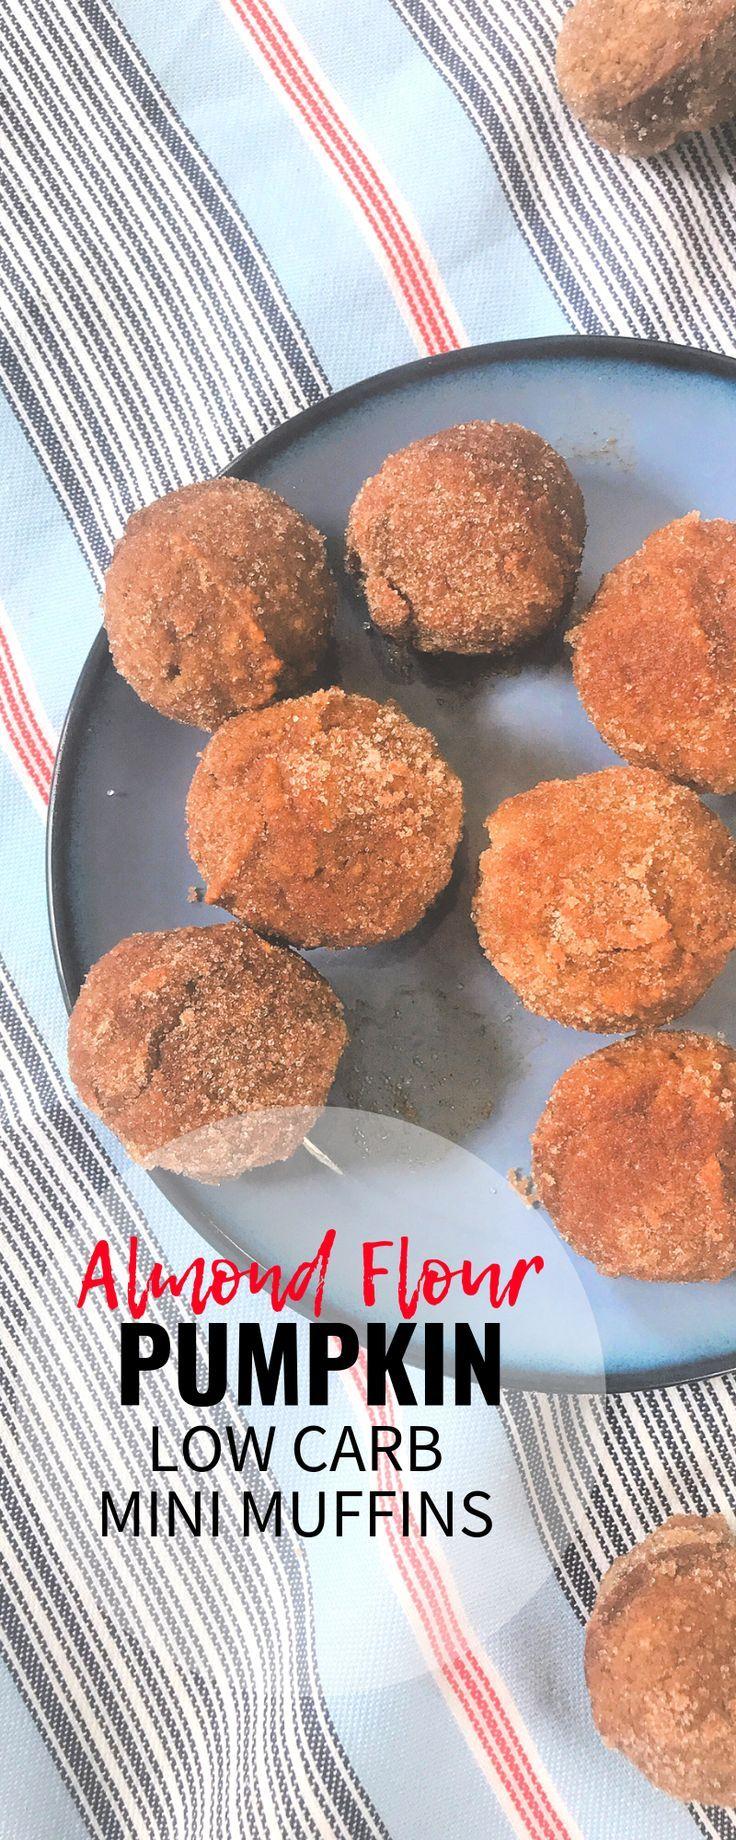 Easy Keto Pumpkin Muffin Minis #pumpkinmuffins